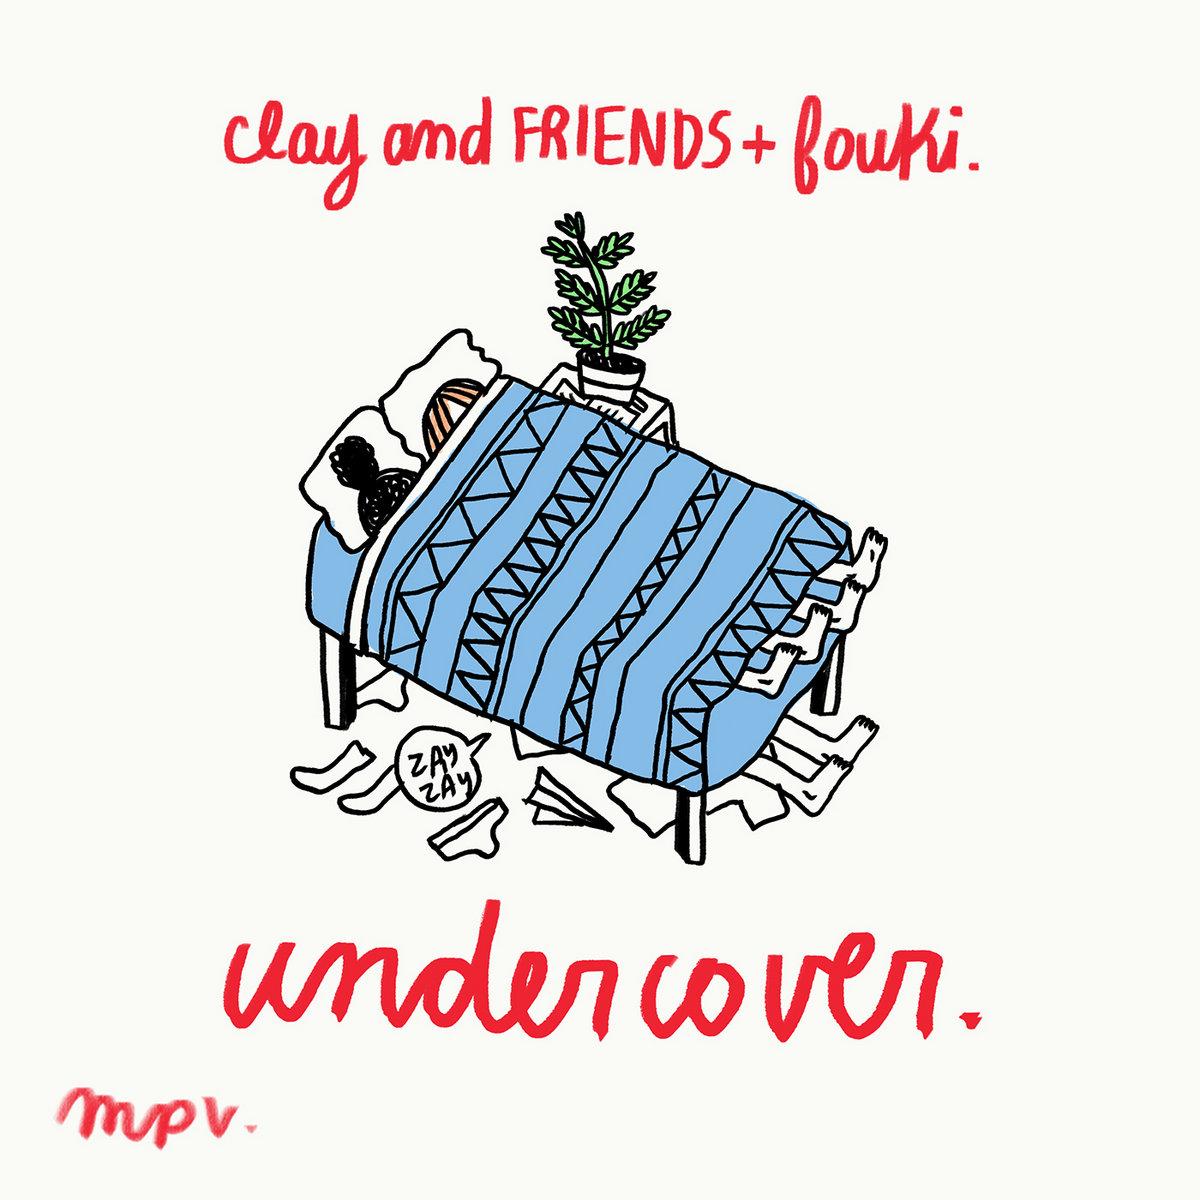 Undercover ft. fouKi